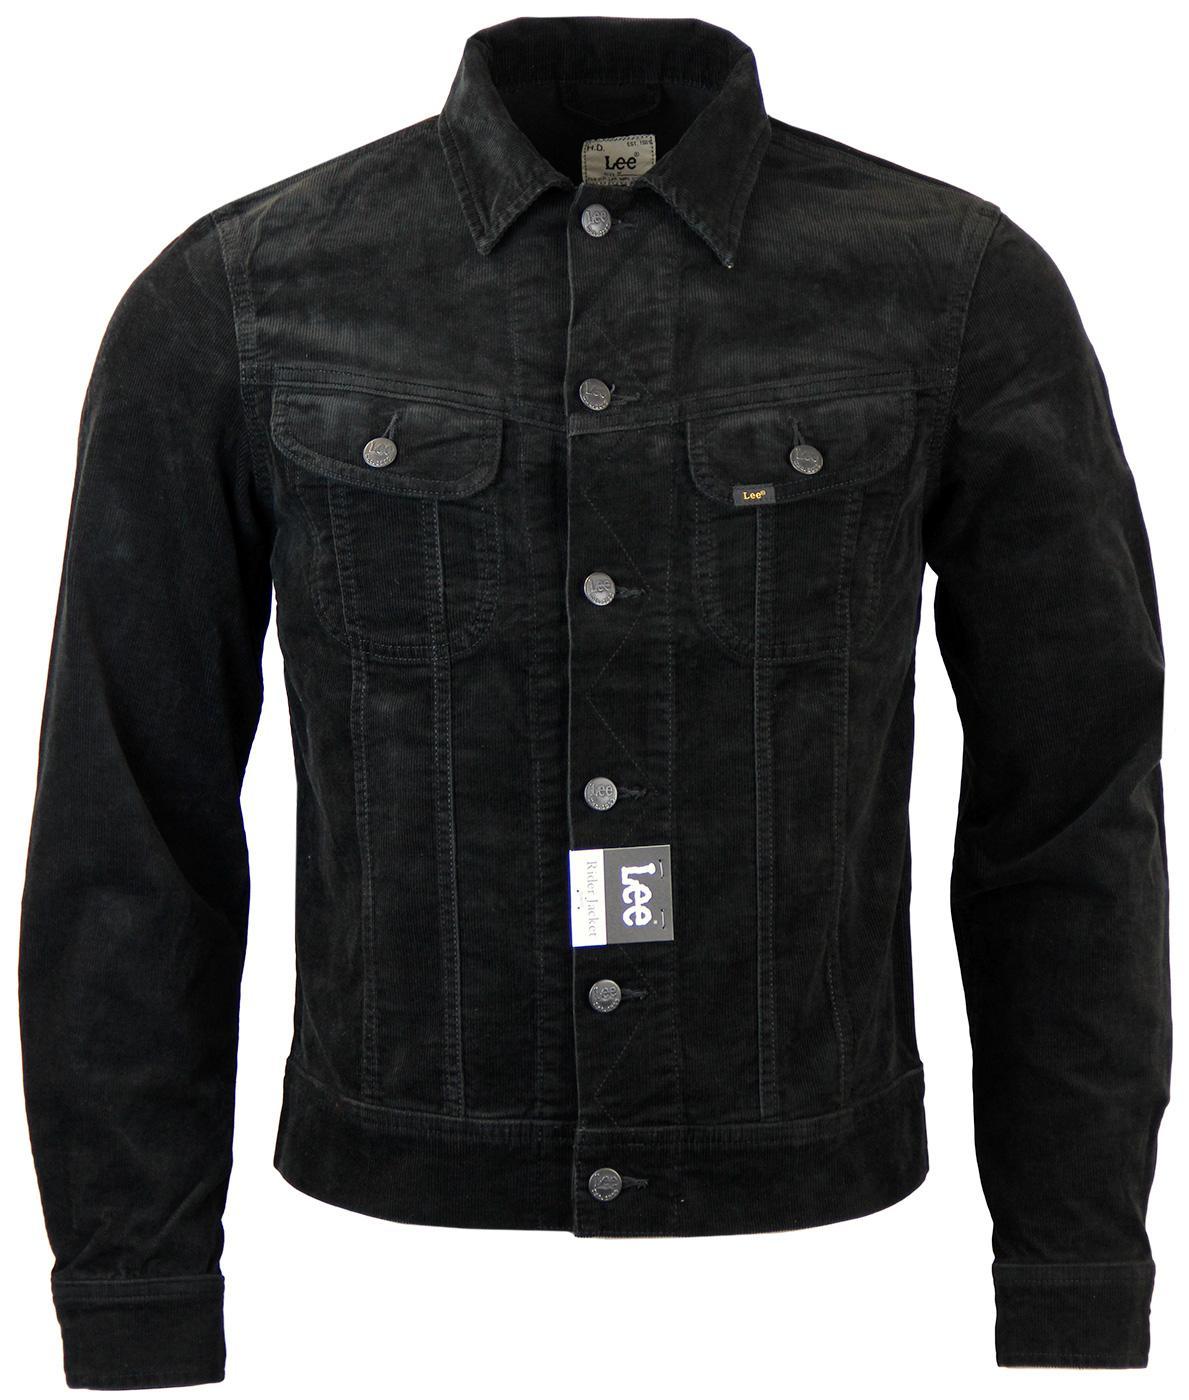 6fad9126 LEE Rider Retro 60s Mod Slim Fit Cord Western Jacket in Black